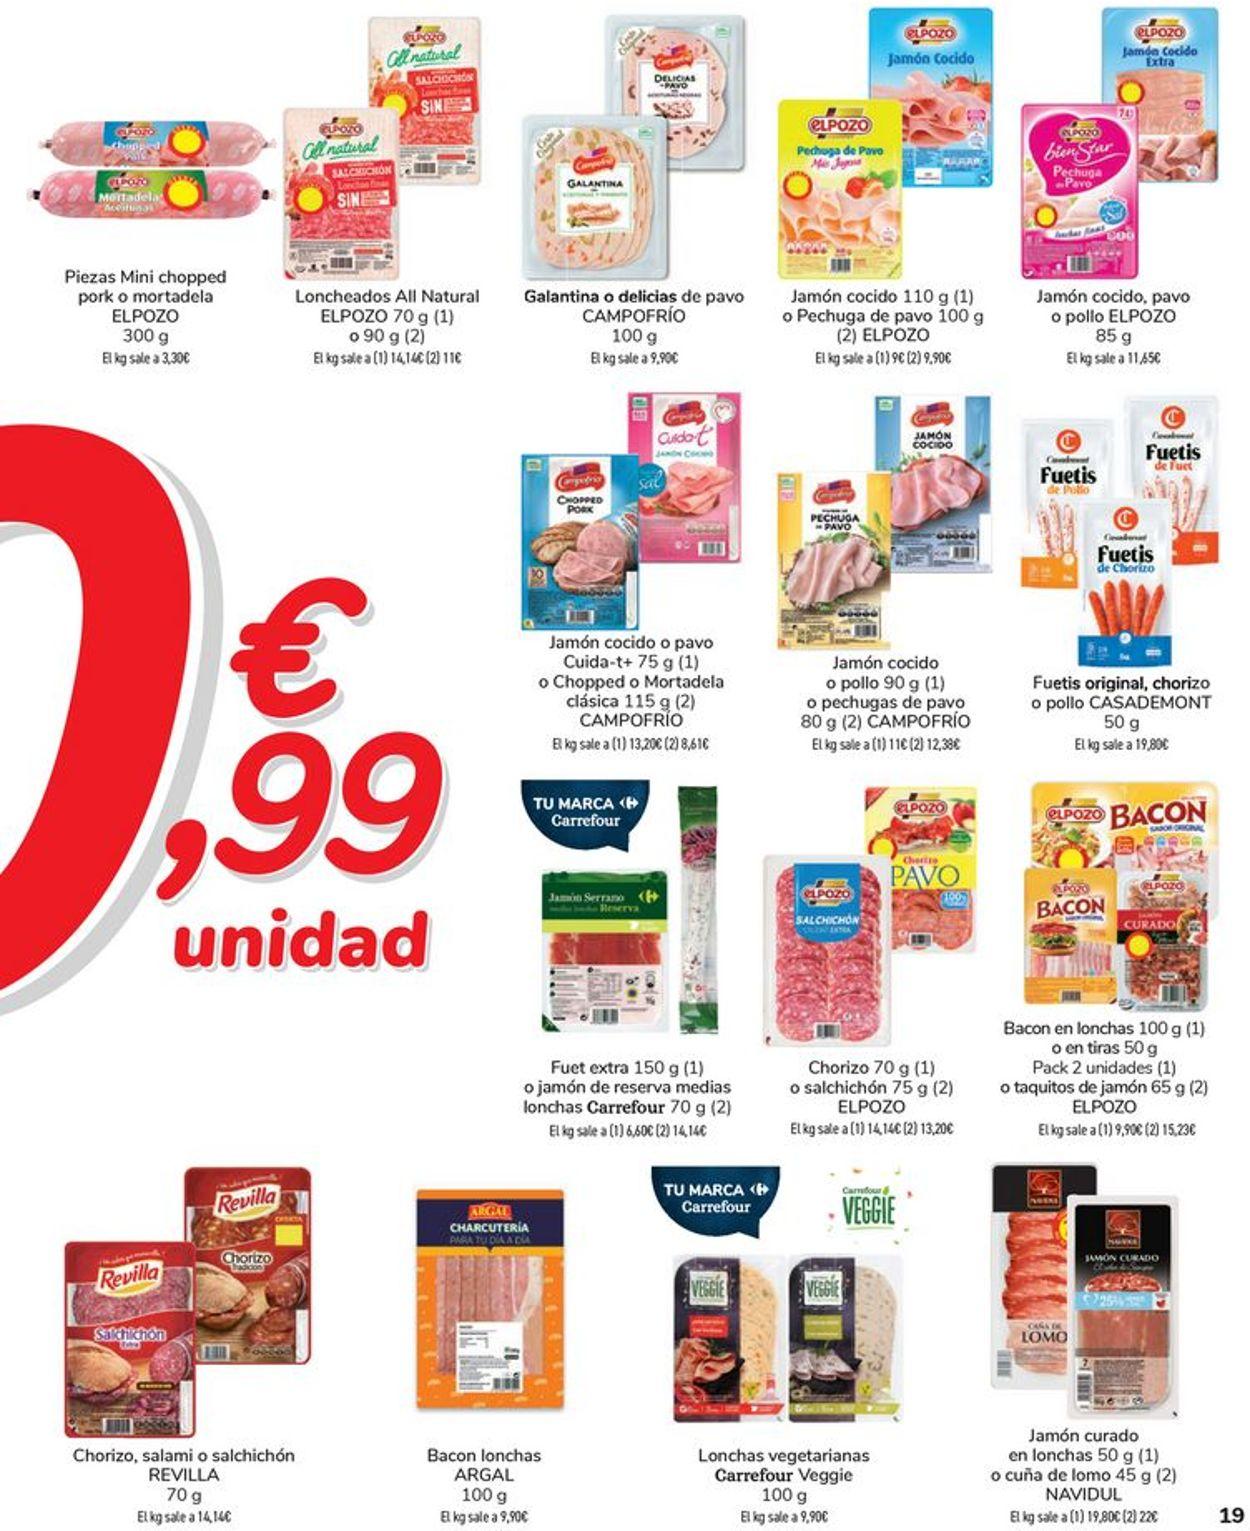 Carrefour Folleto - 12.02-23.02.2021 (Página 19)